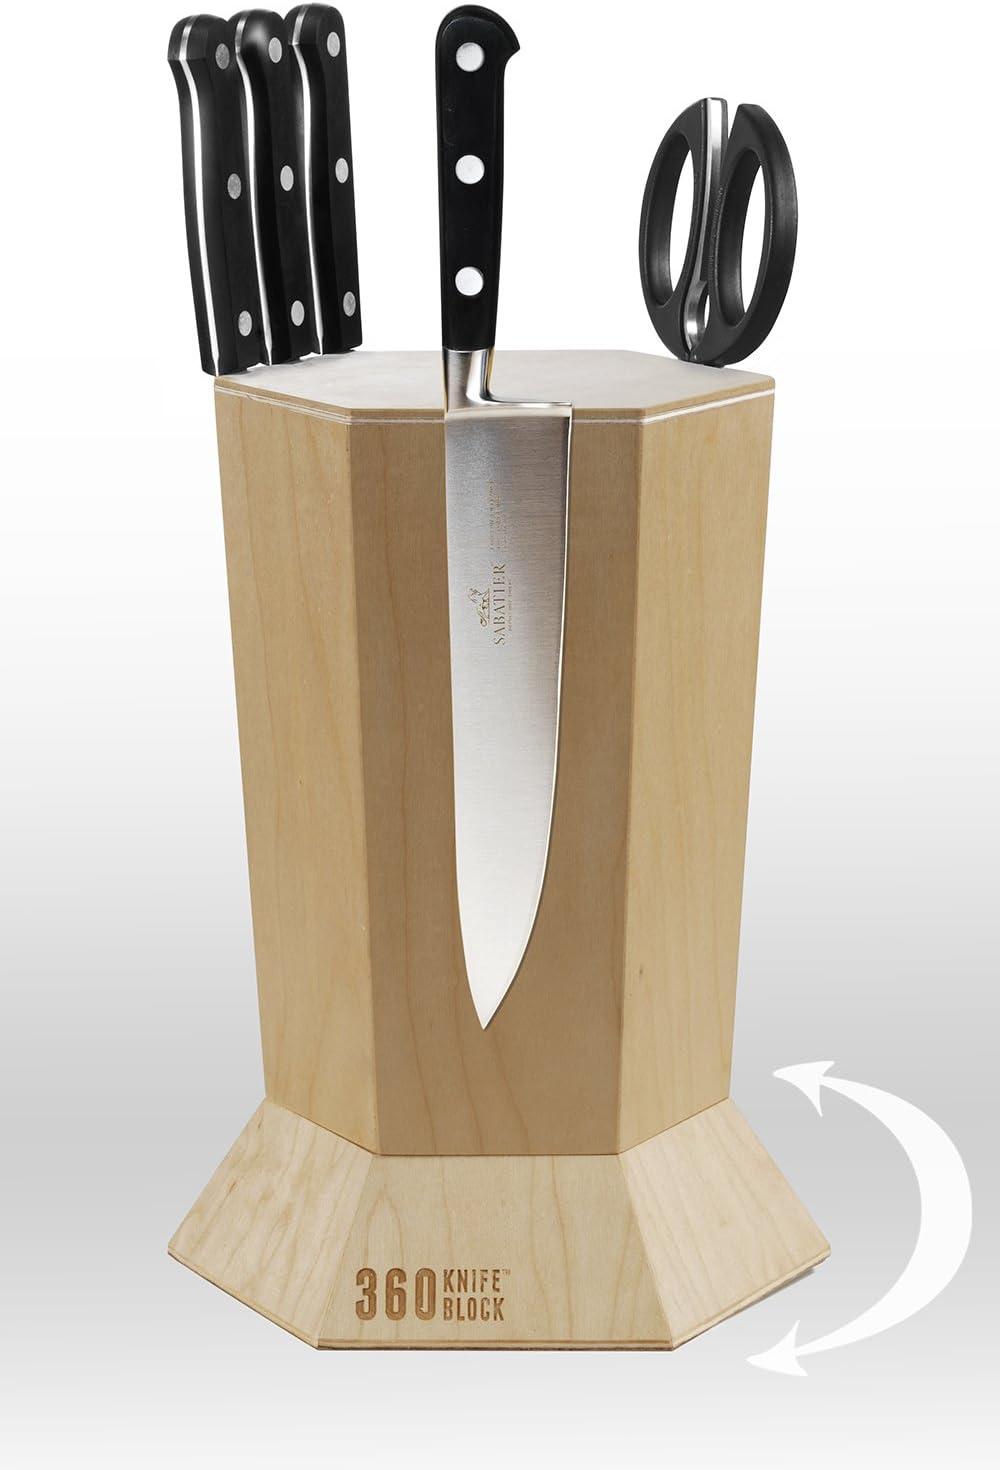 360 Knife Block - (Ebonized Walnut) ROTATING - Magnetic - BEST Universal Knife Block Maple